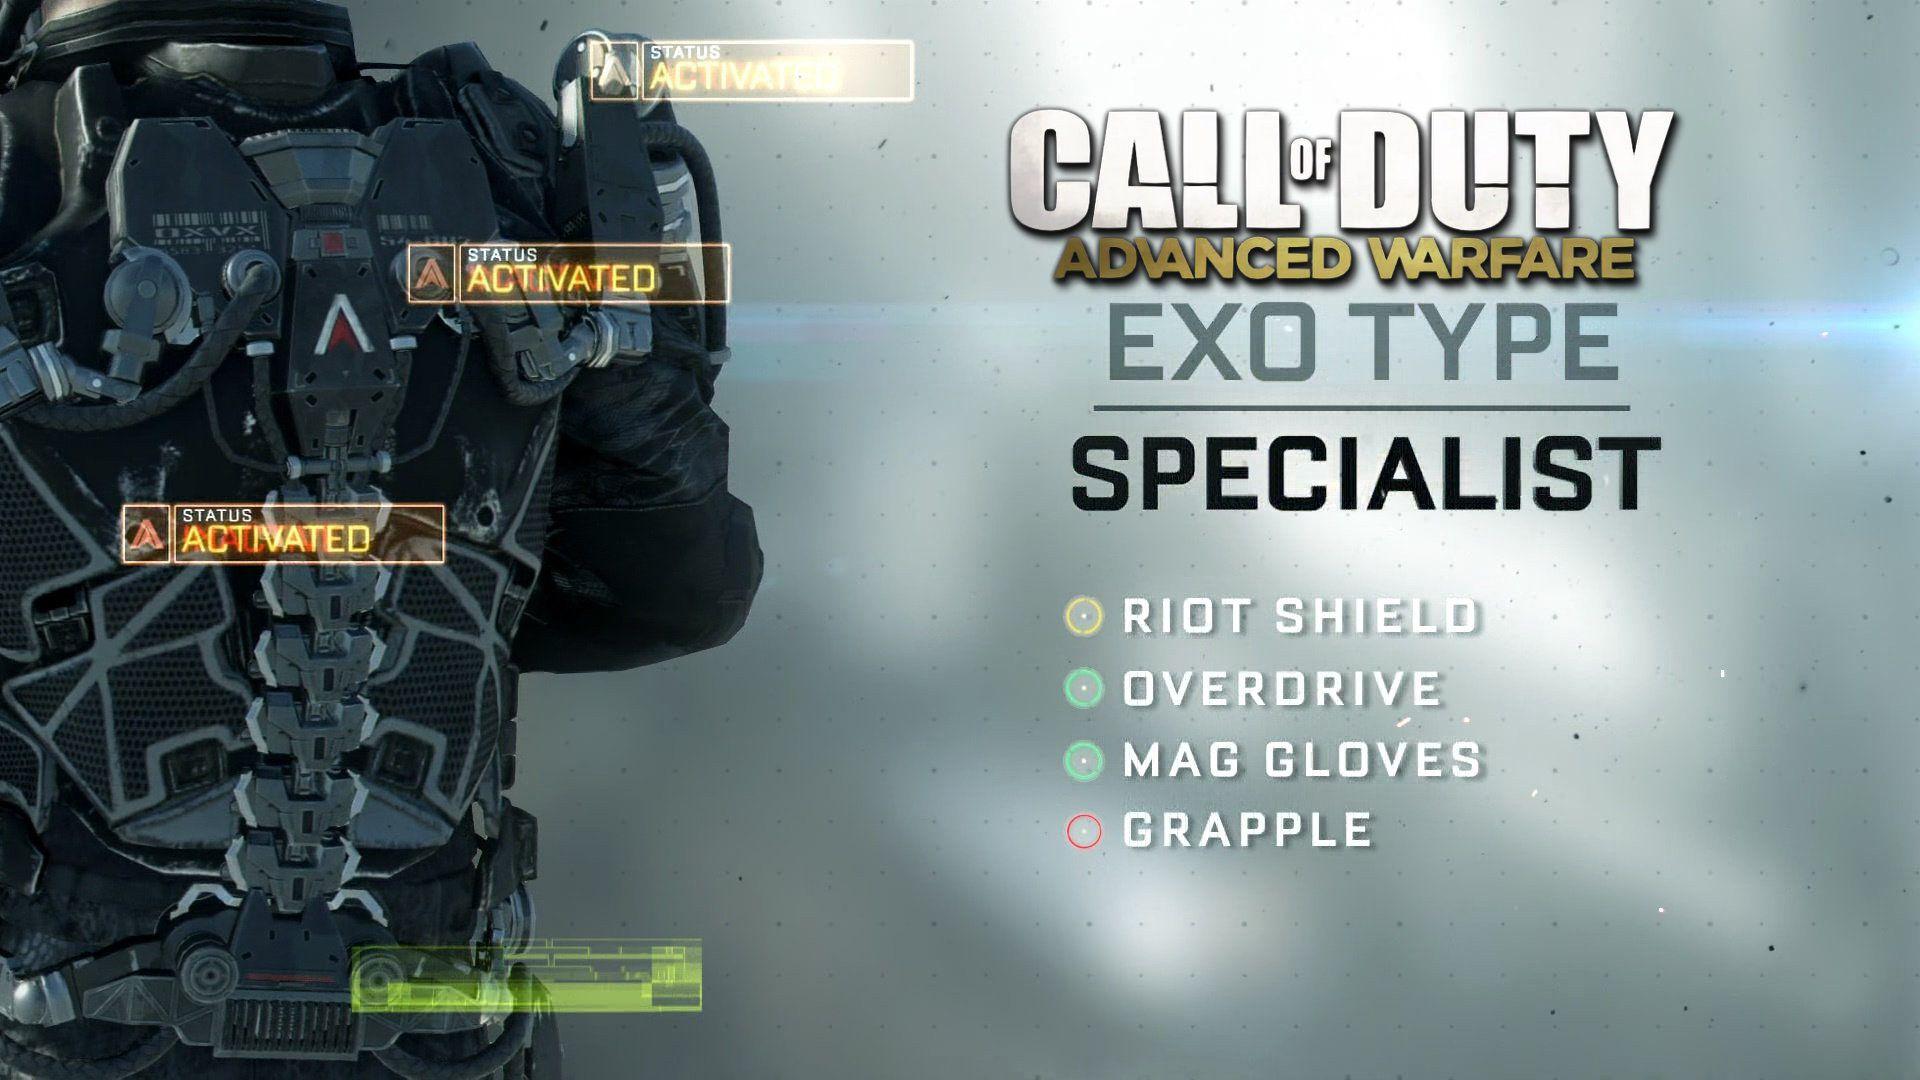 Call of Duty: Advanced Warfare Exo Suit